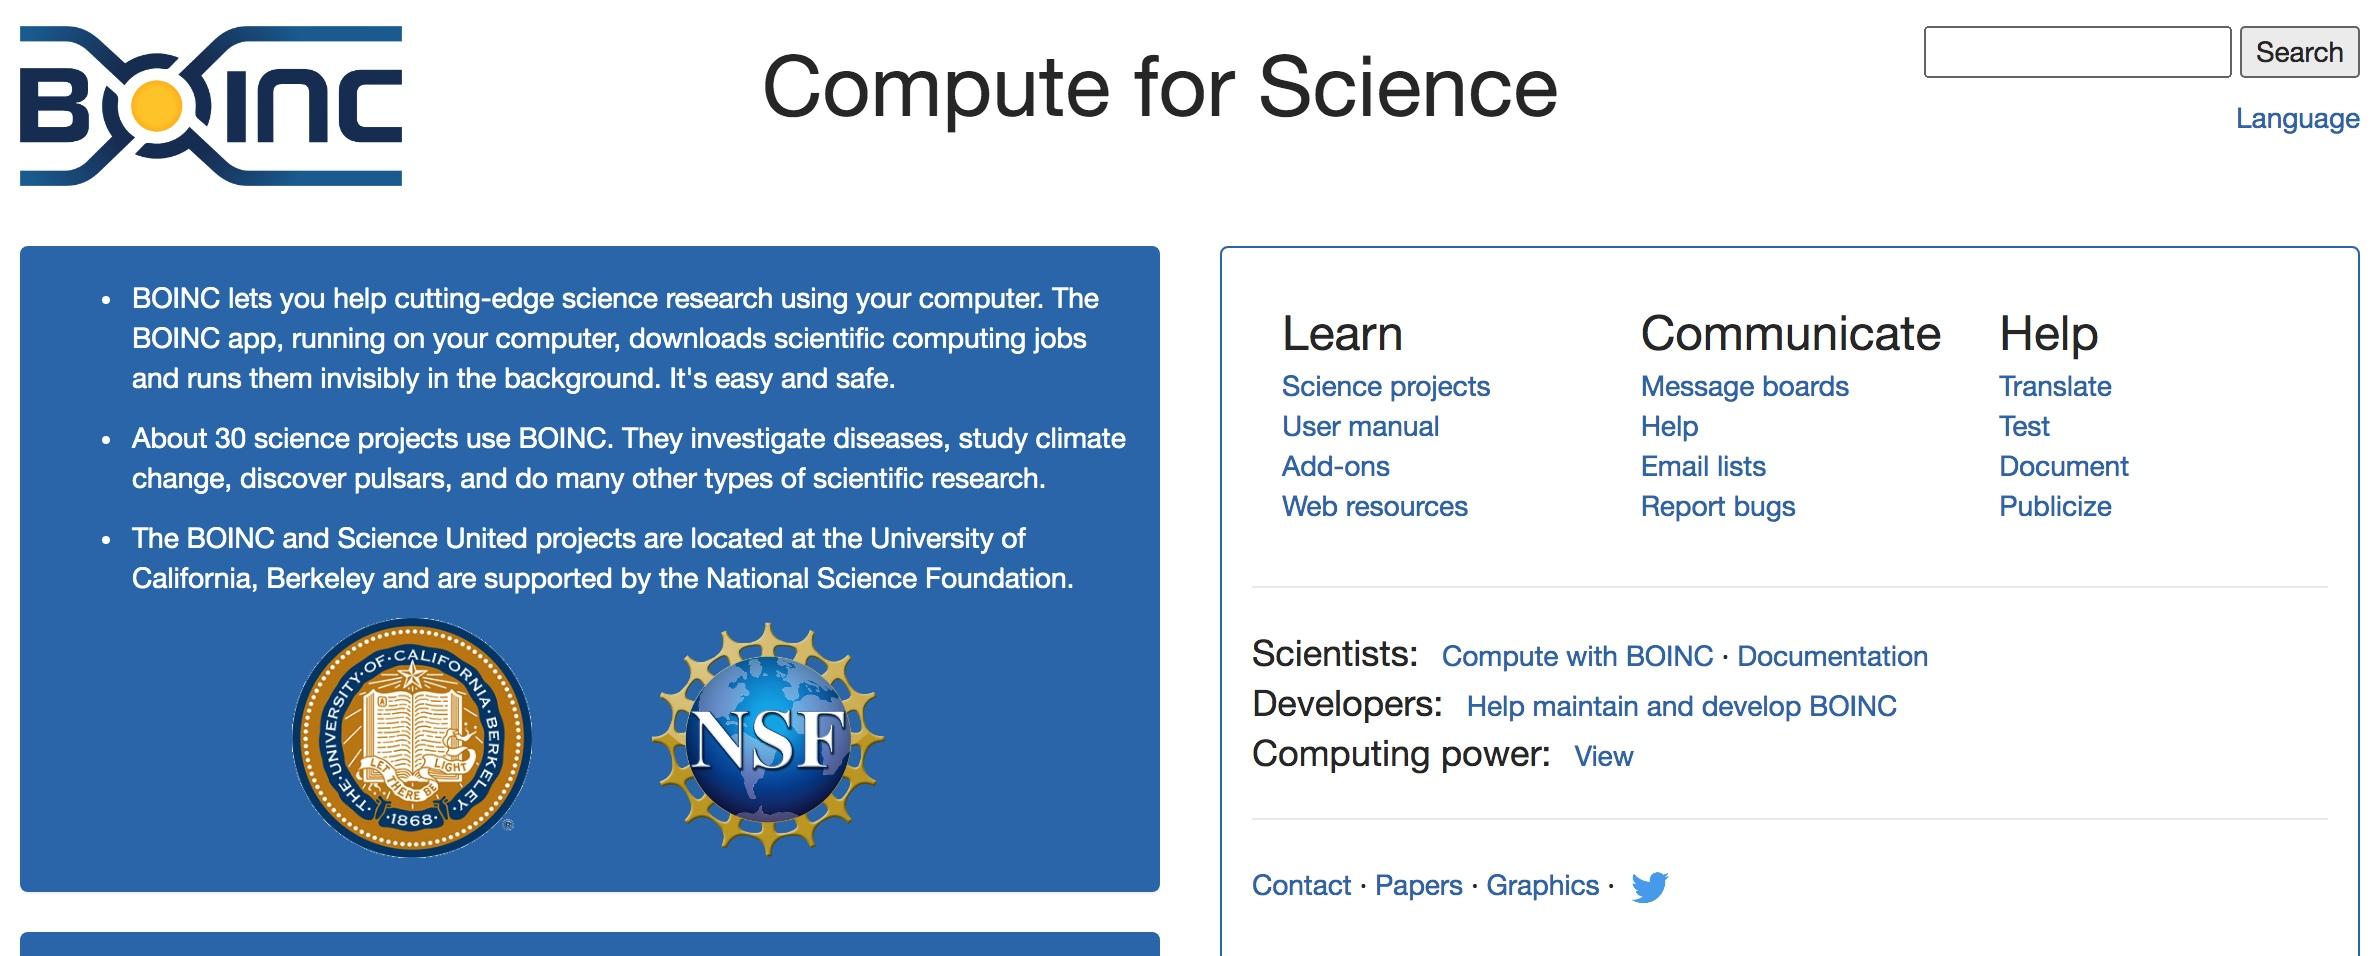 An open-source project BOINC